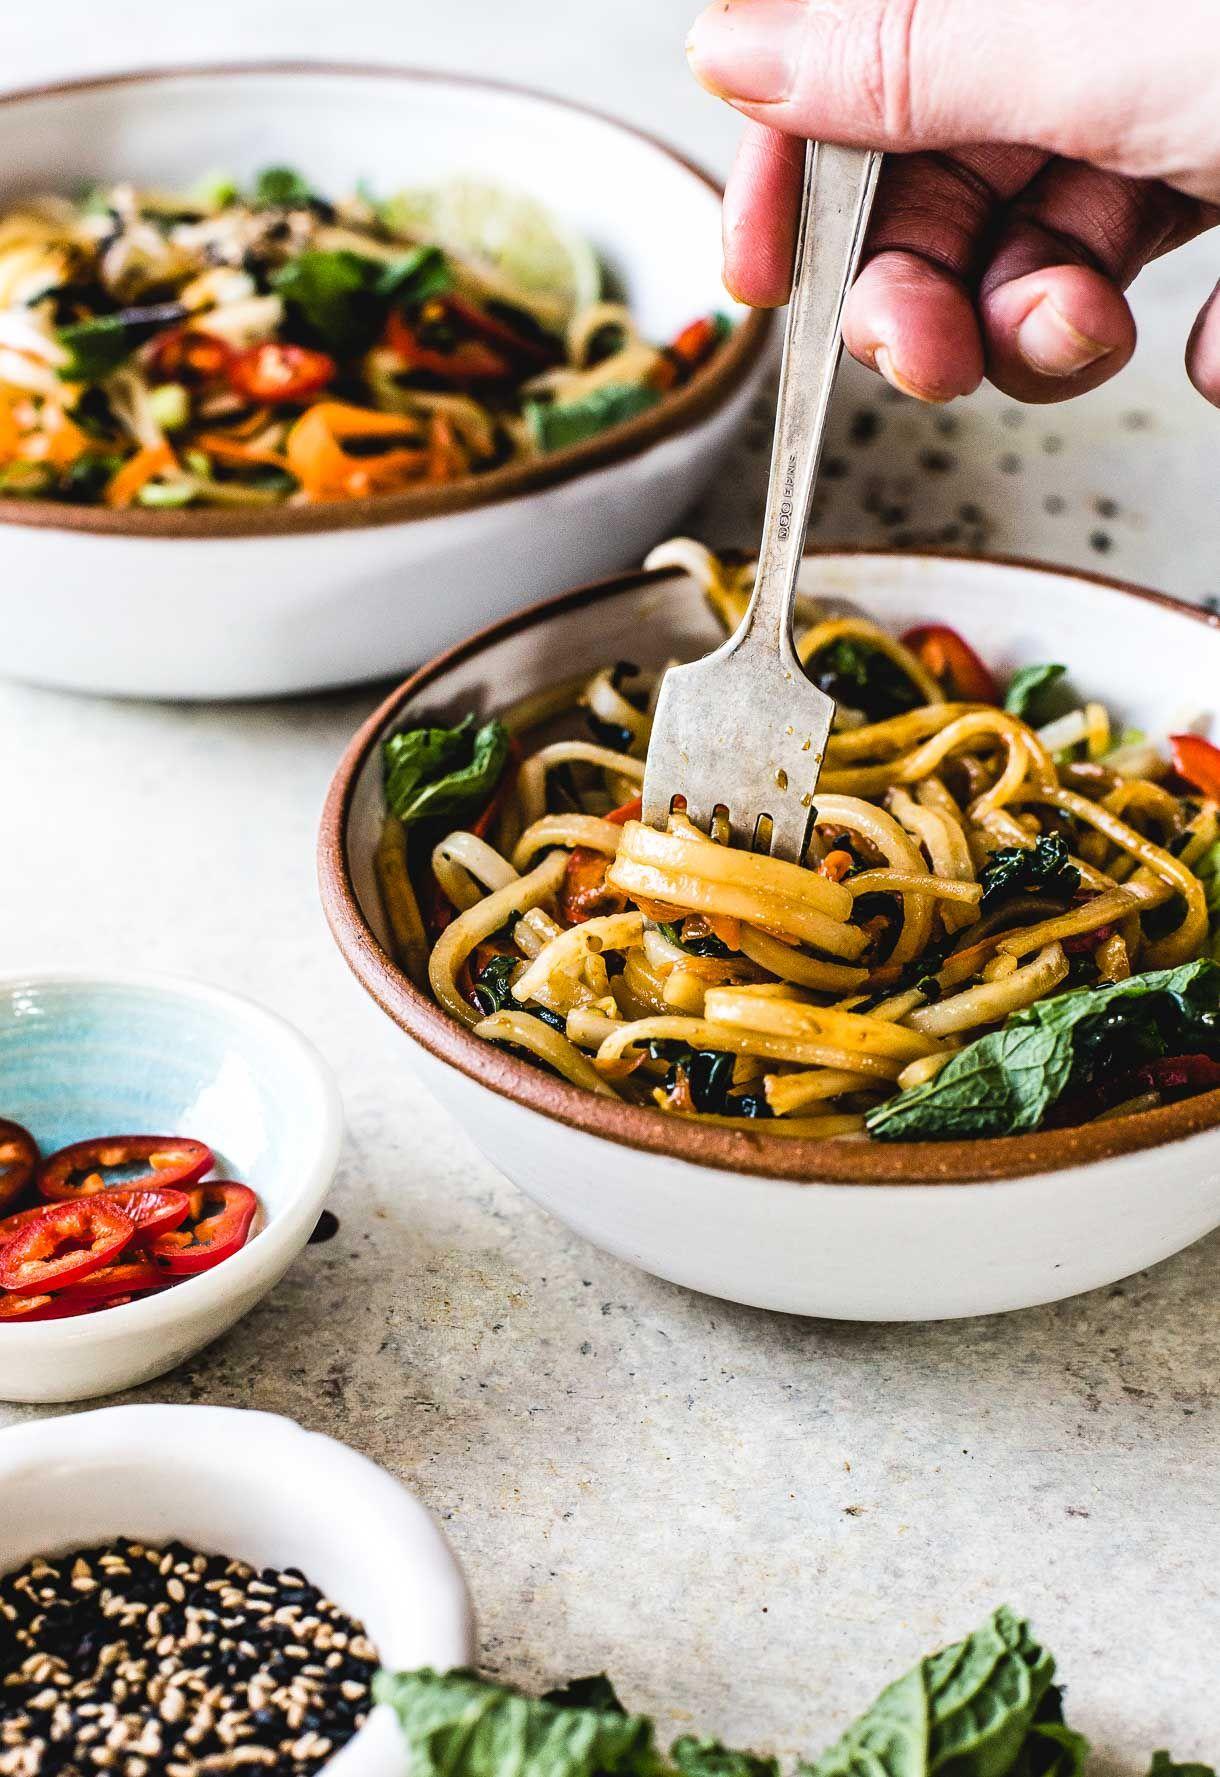 Sesame Thai Rice Noodles With Vegetables Vegan Recipe Recipe Rice Noodles Winter Vegetarian Recipes Autumn Recipes Vegetarian